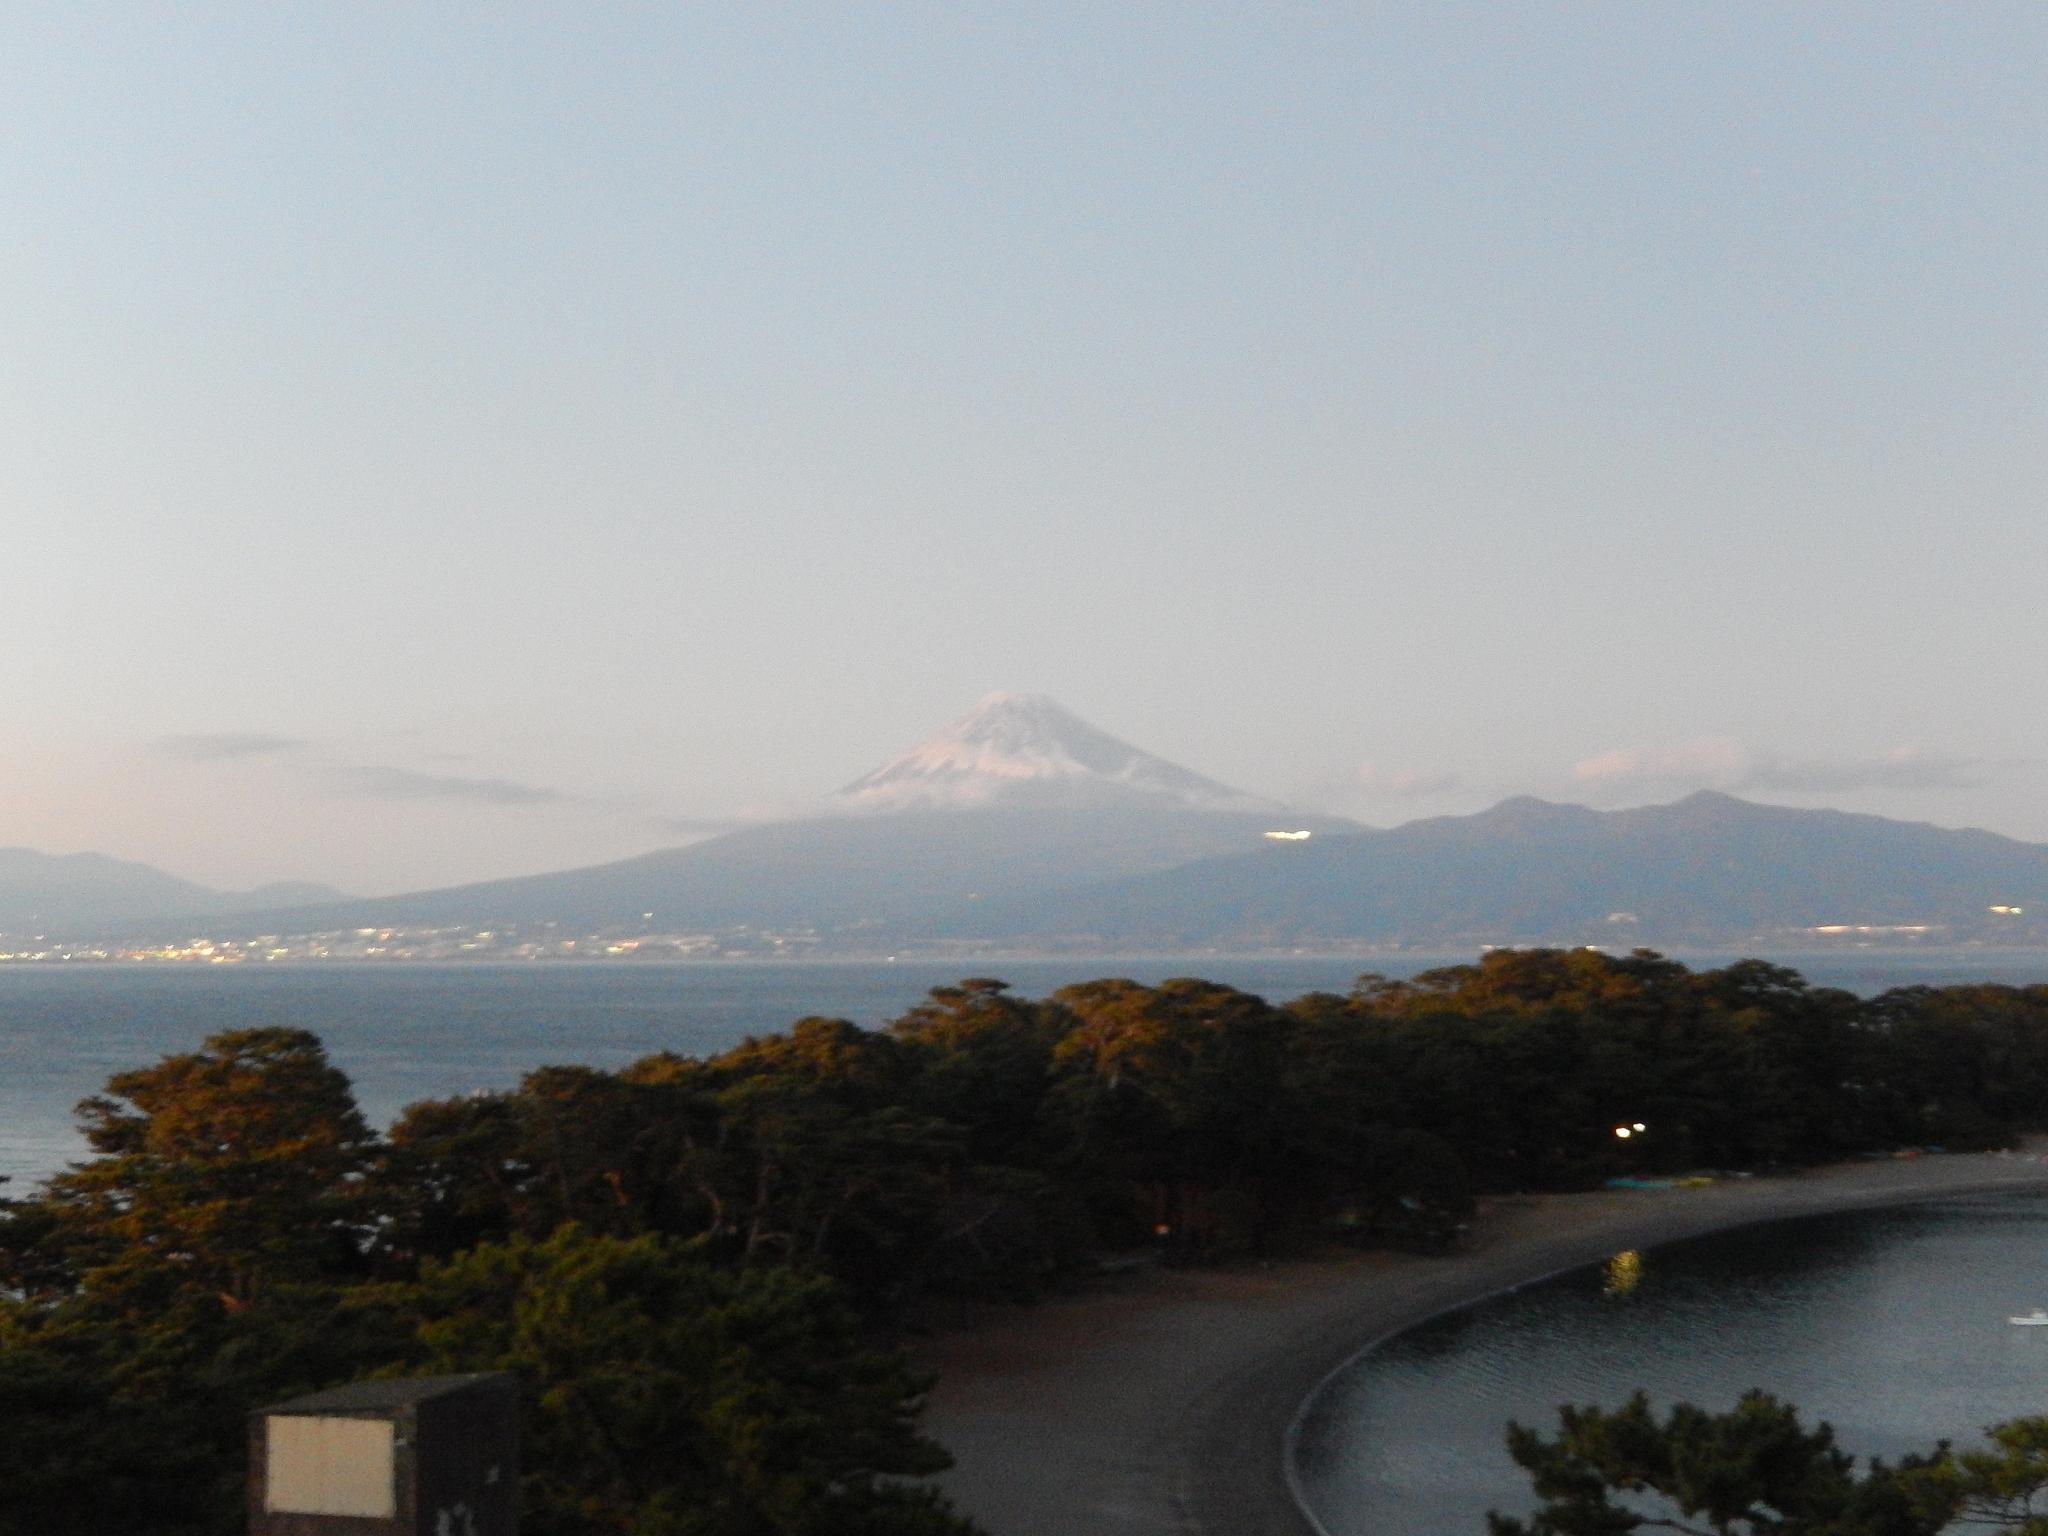 f:id:ToshUeno:20151229171010j:plain